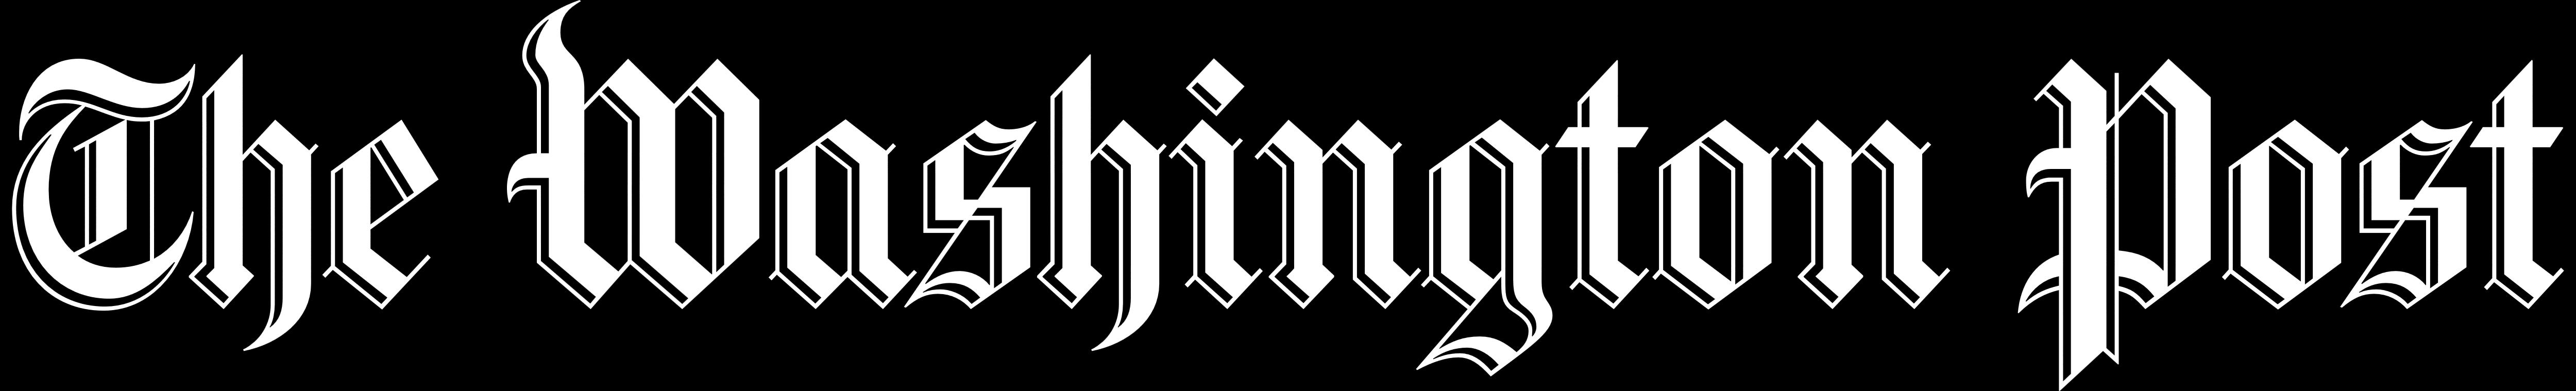 http://logos-download.com/wp-content/uploads/2016/05/The_Washington_Post_logo_black.png